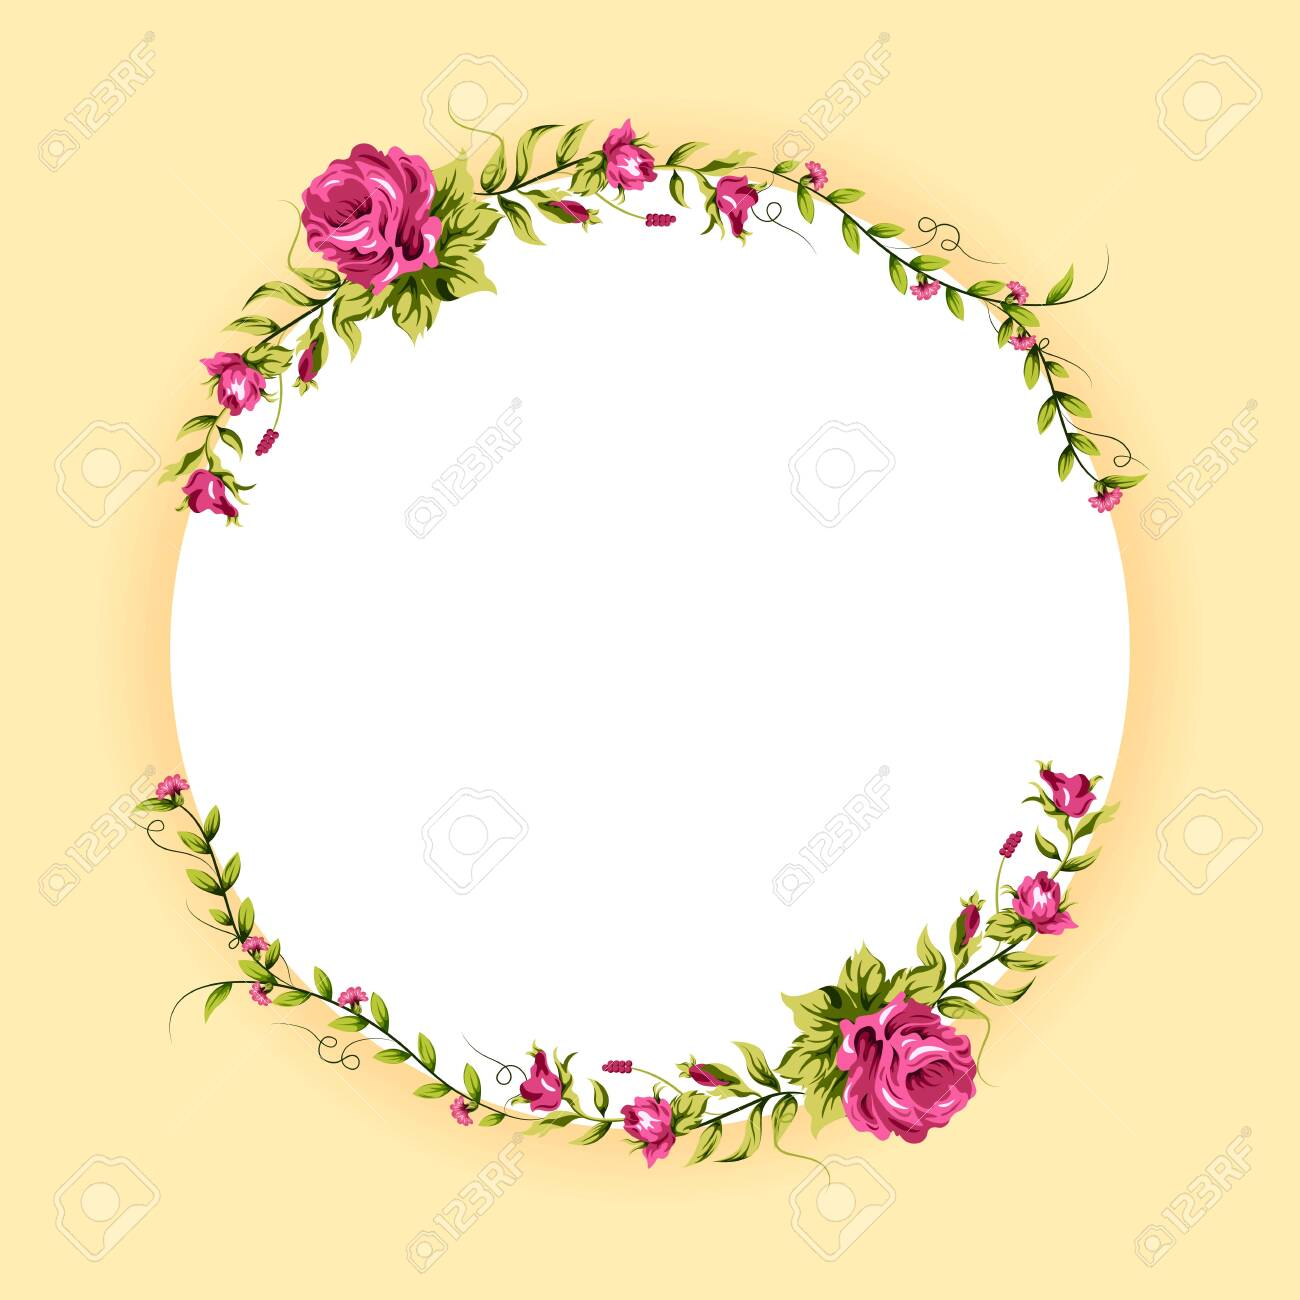 Spring fresh flower in floral banner poster background - 146905027